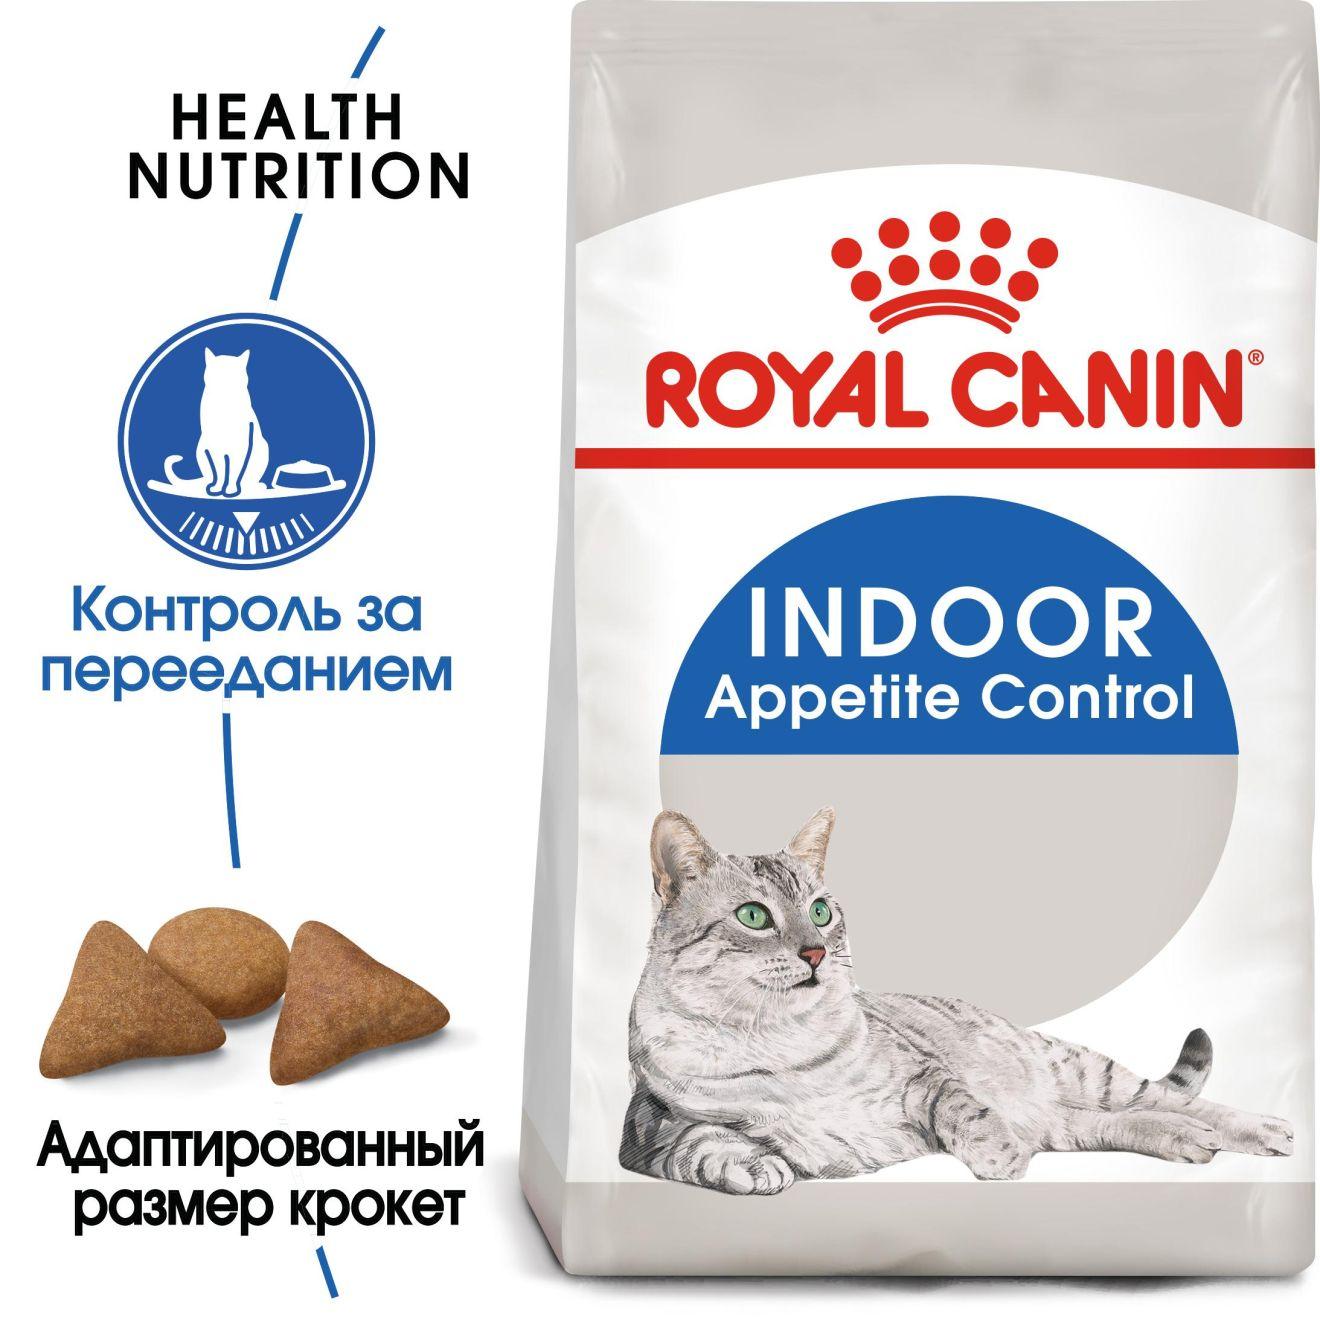 Indoor Appetite Control